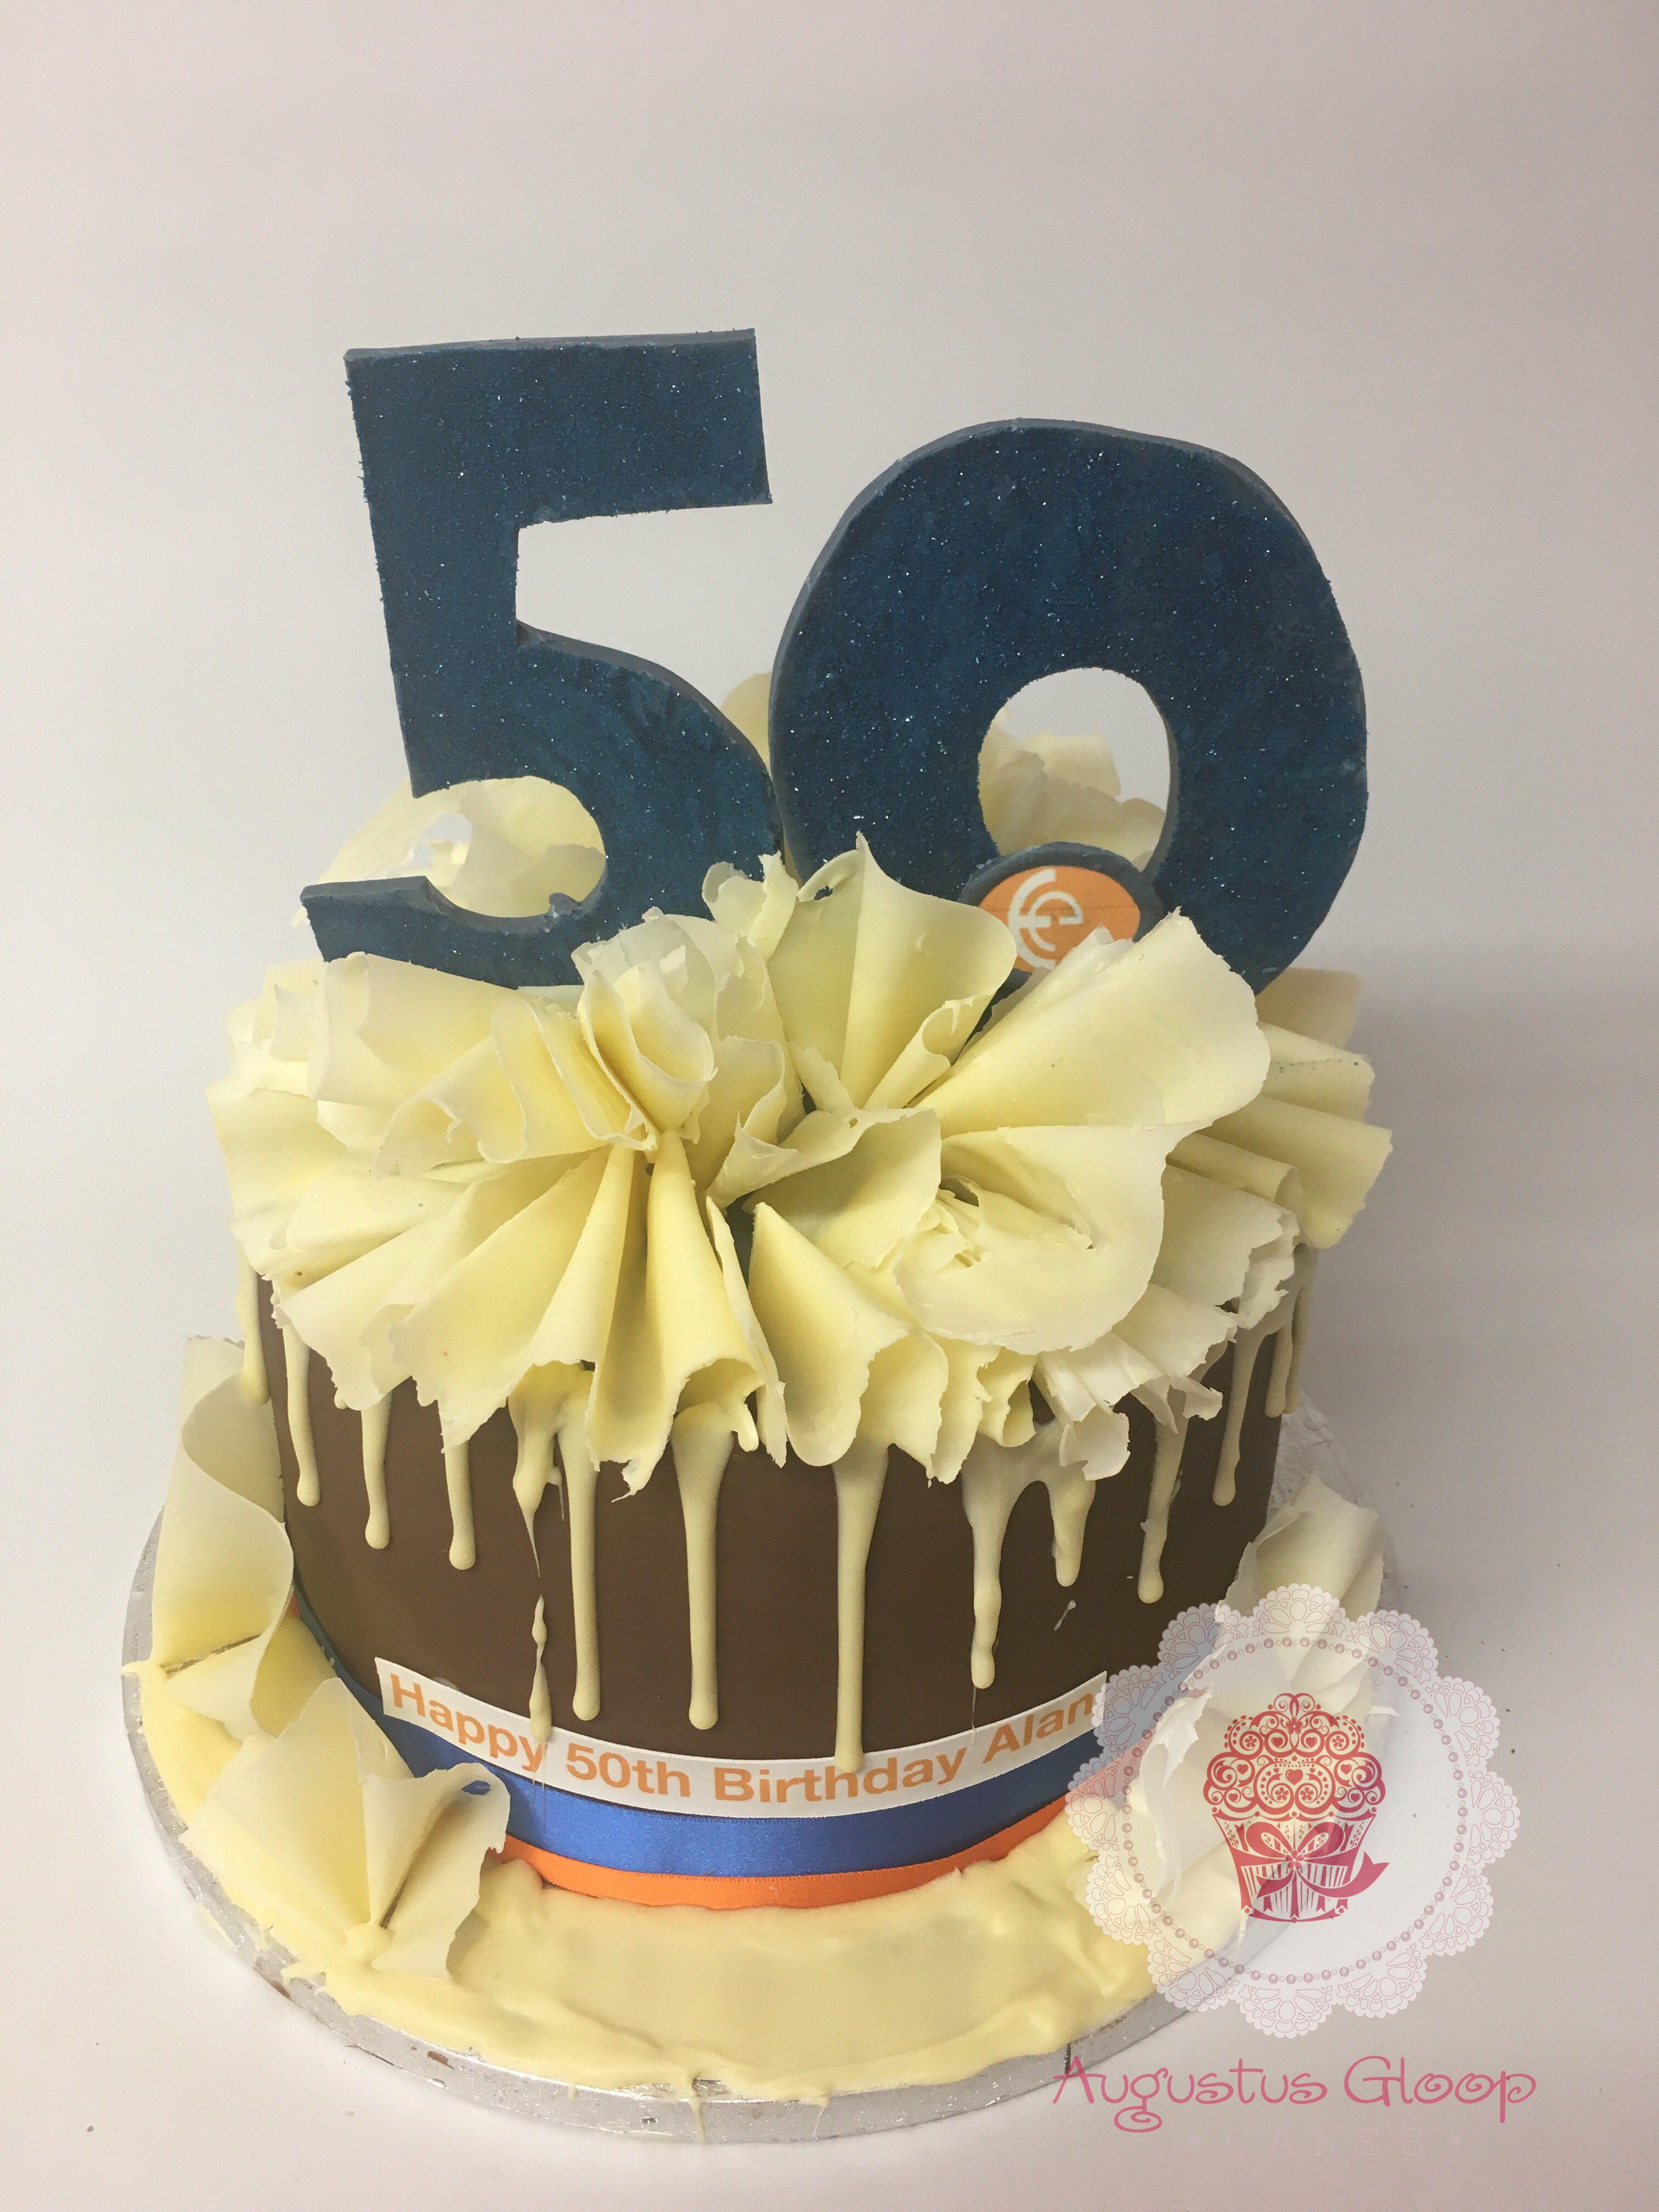 Augustus Gloop Cakes Cake, 50th birthday cake, Happy